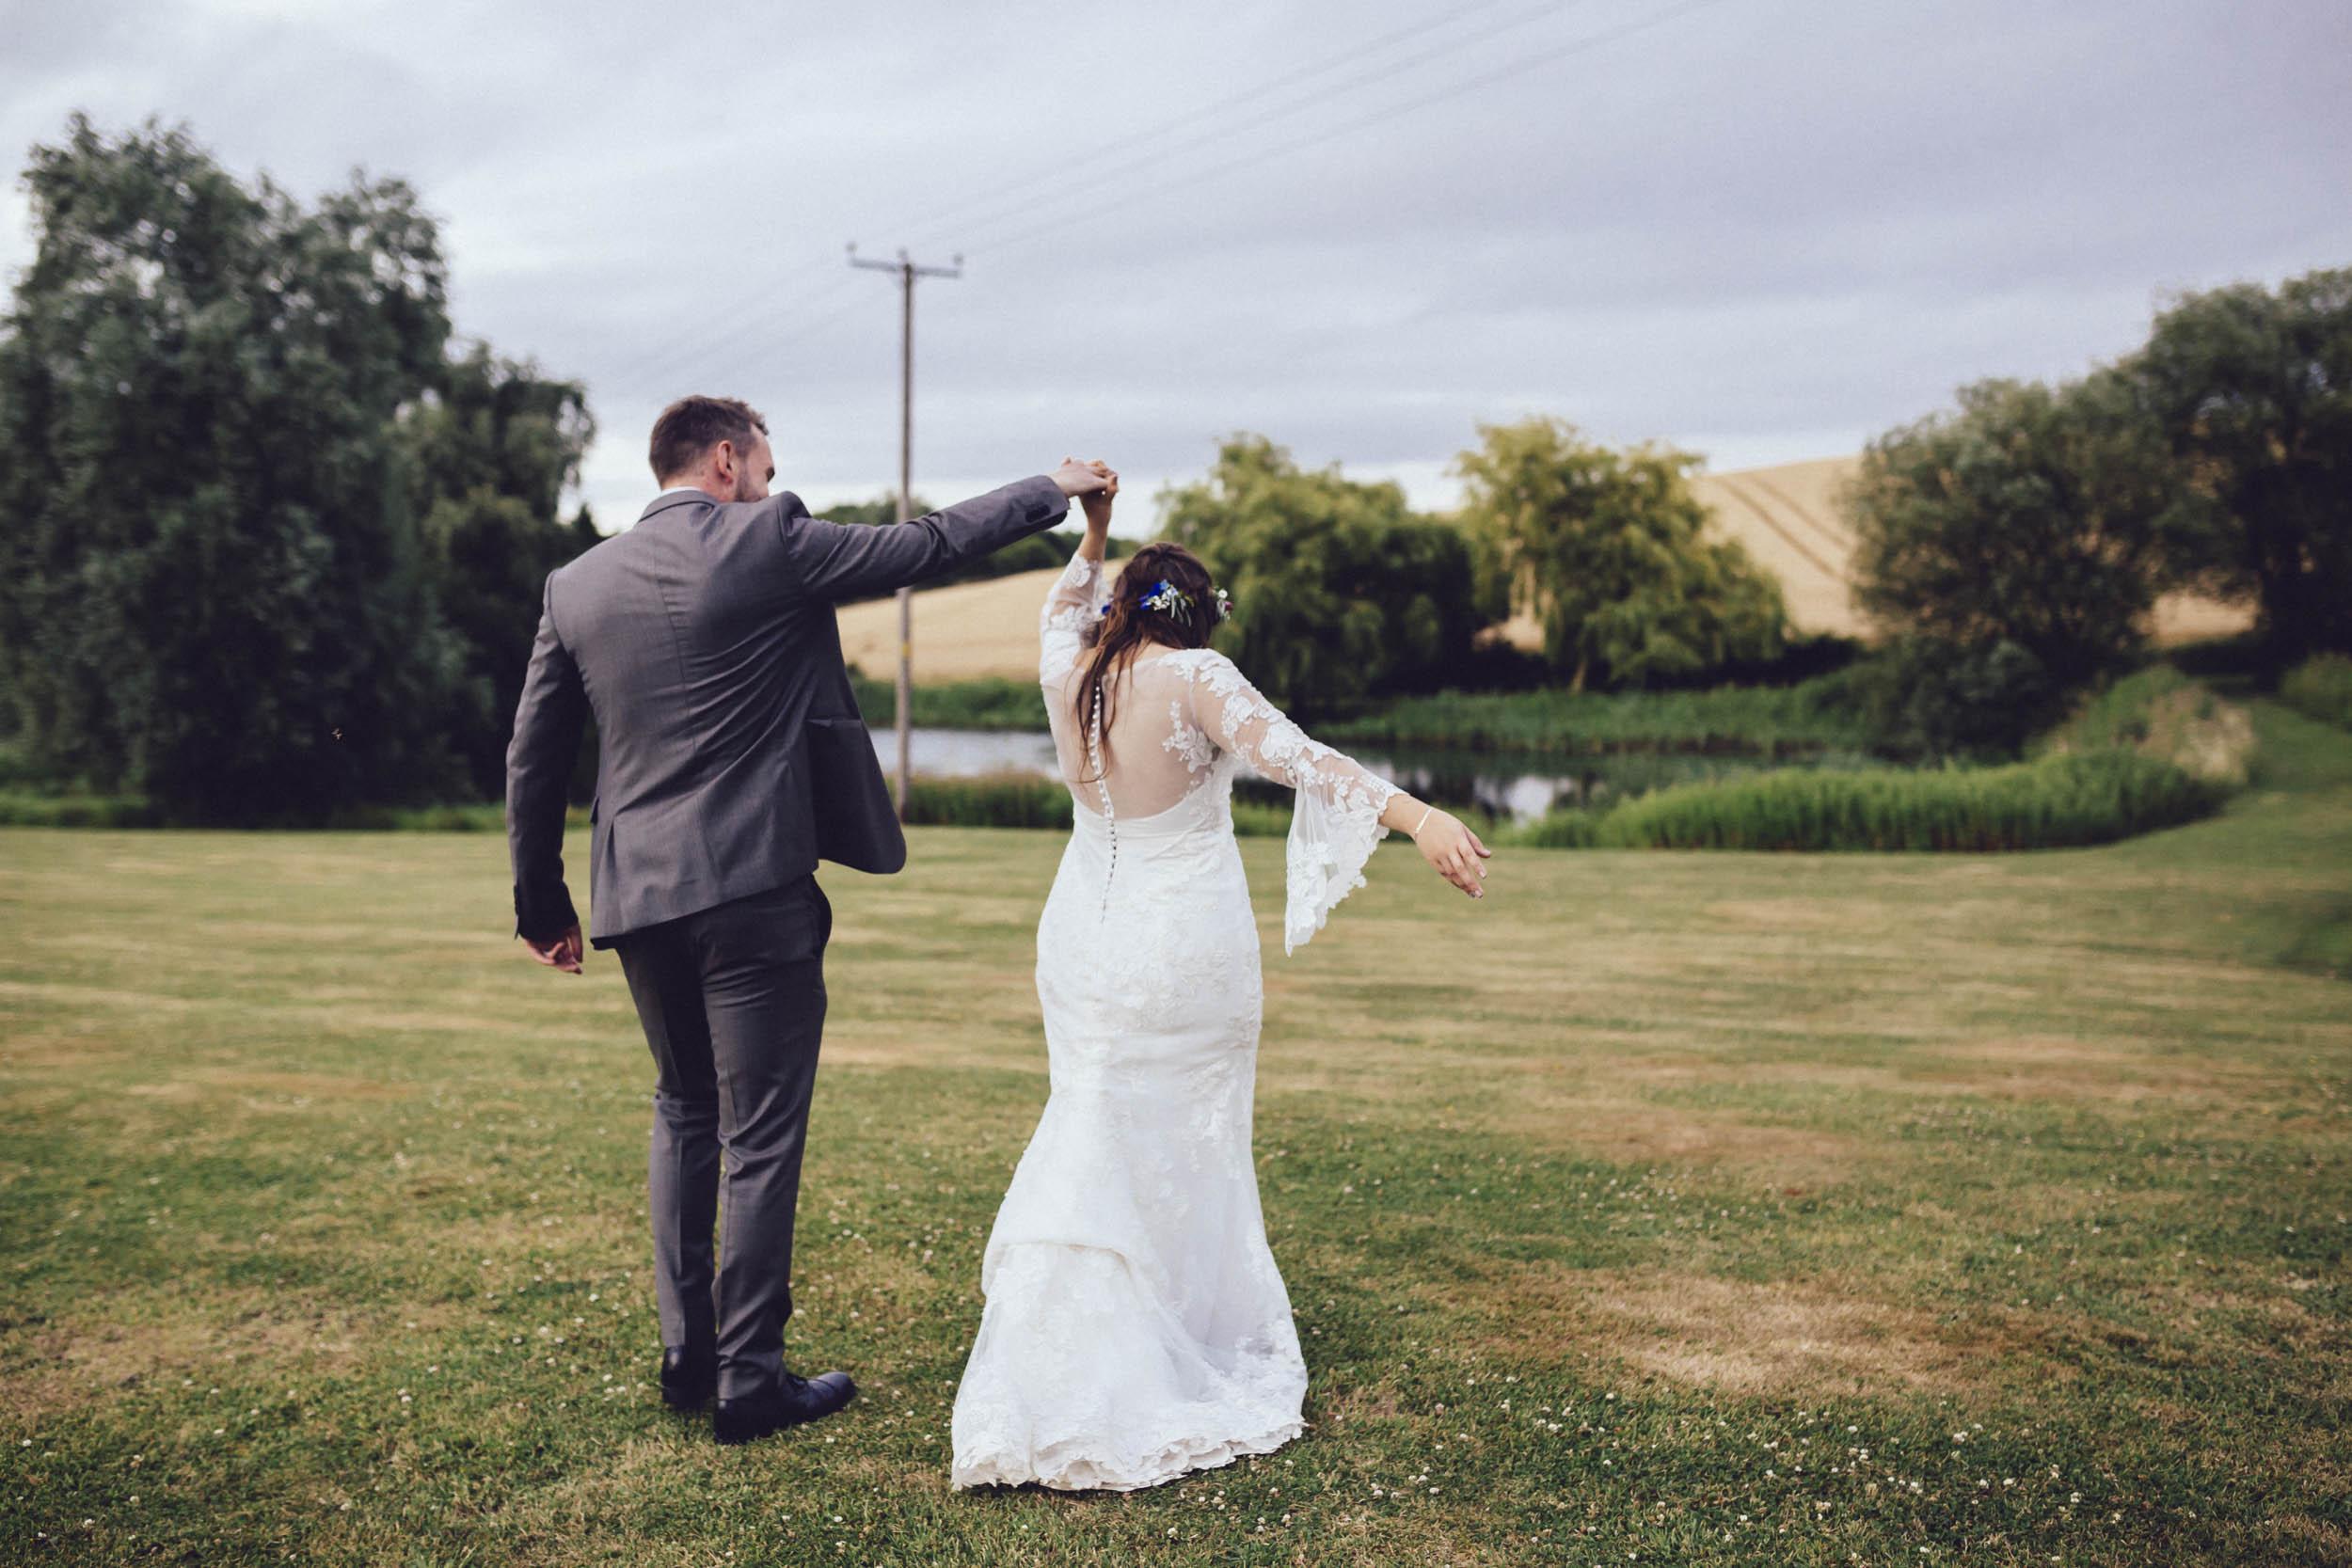 29Curious Rose Wedding Photography- Laura Rhodes- Newton Park Farm- Birmingham Artistic wedding photography-bride and groom.jpg